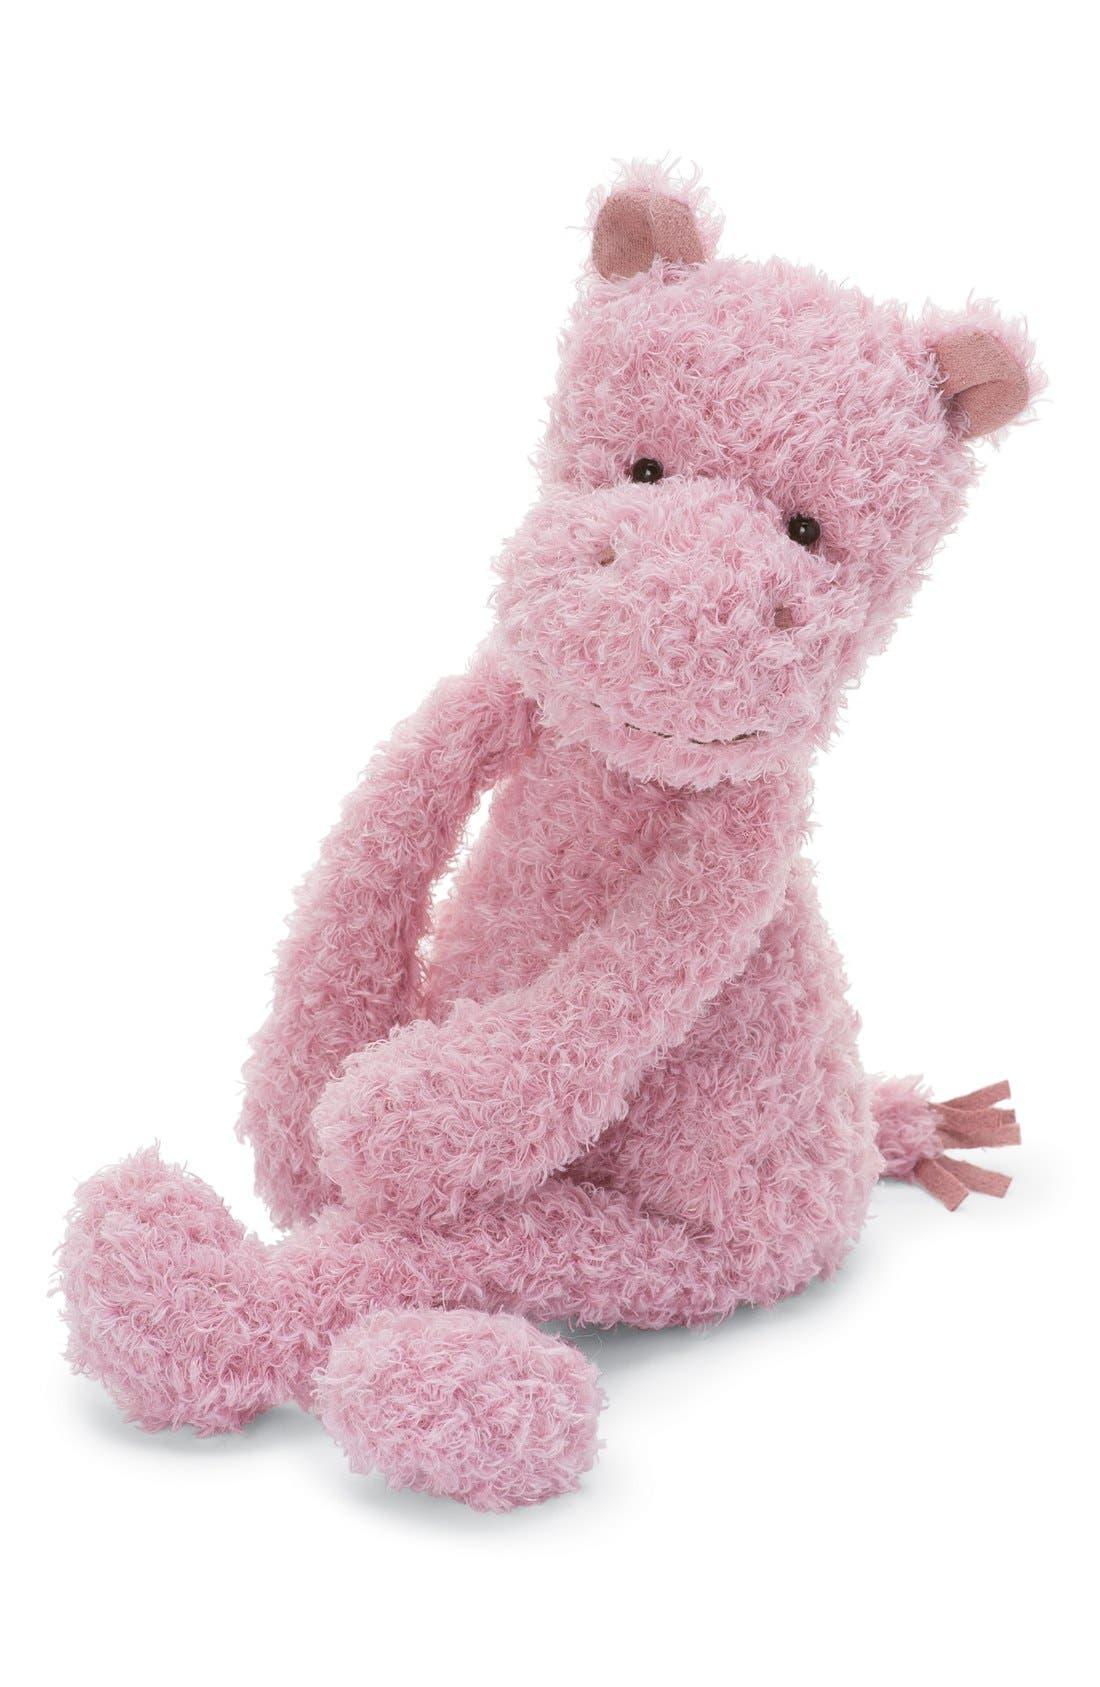 Main Image - Jellycat 'Wild Thing Hippo' Stuffed Animal